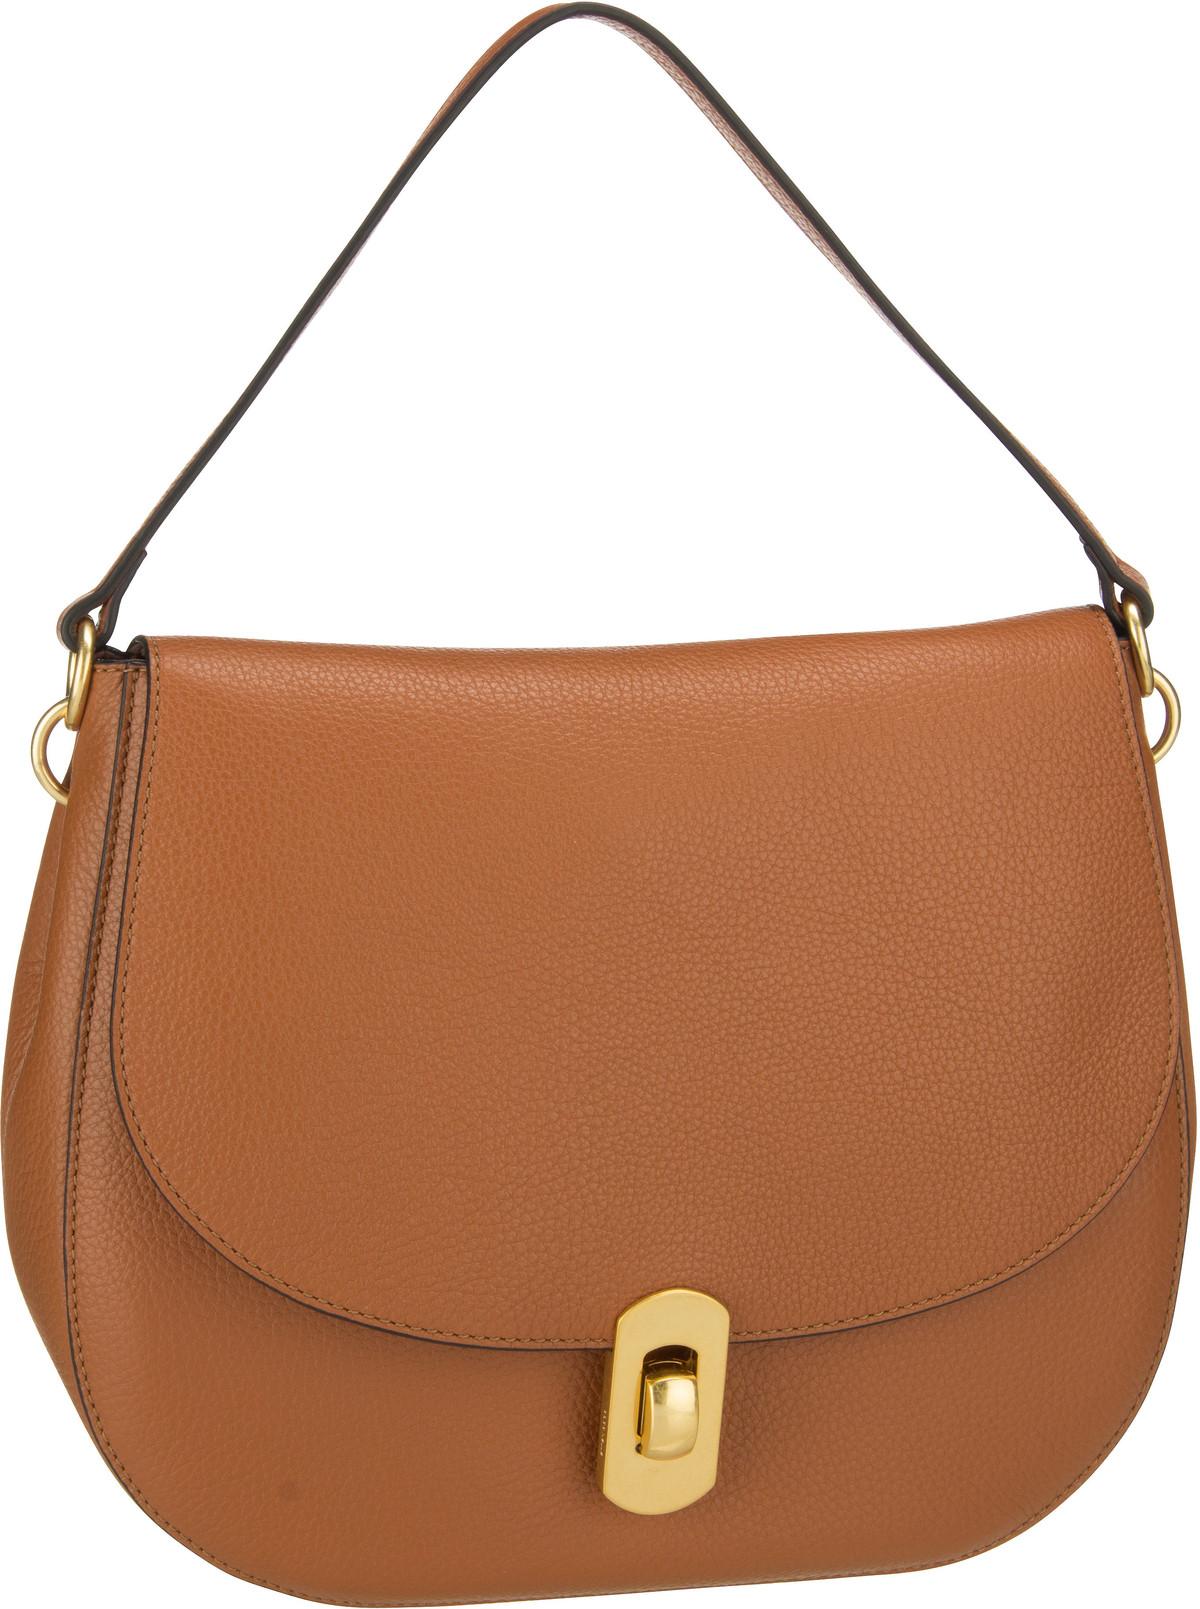 Handtasche Zaniah 1501 Tan